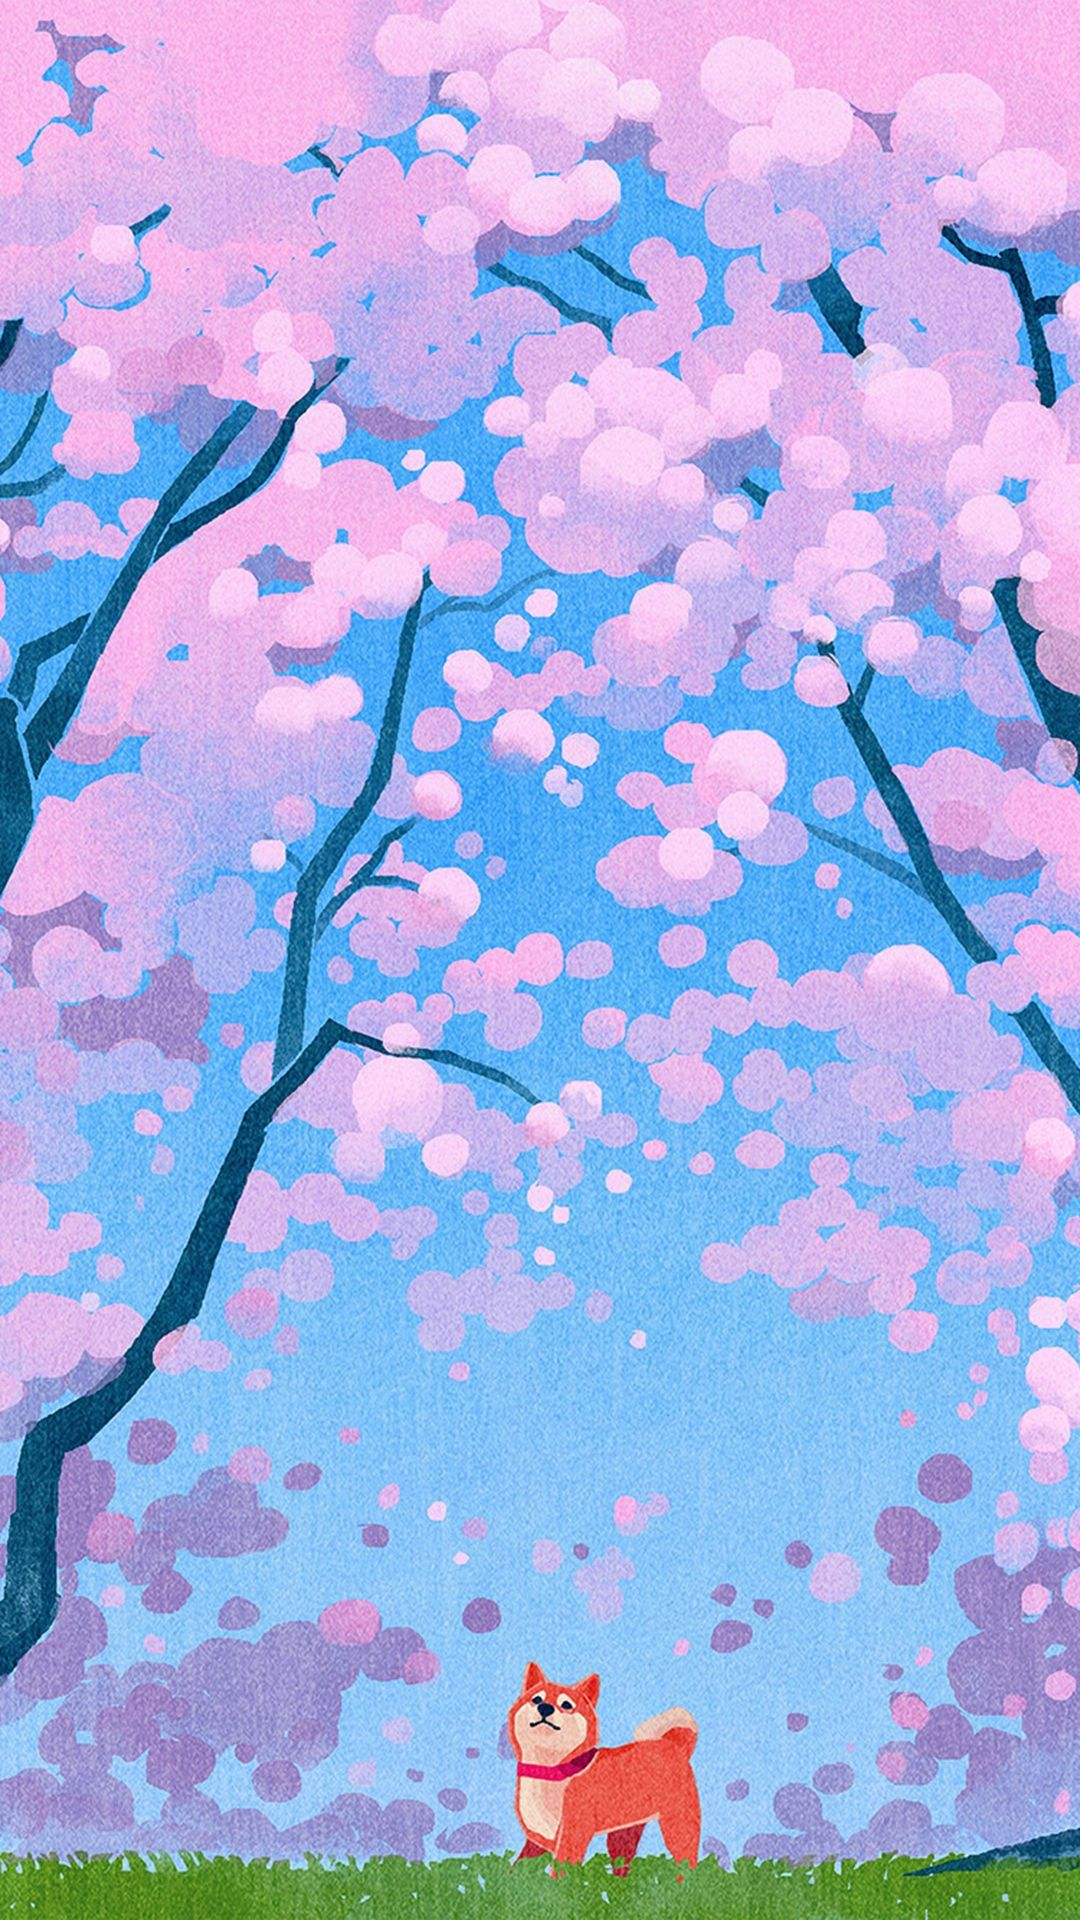 Cute Siba Dog Animal Spring Illustration Art iPhone 6 wallpaper